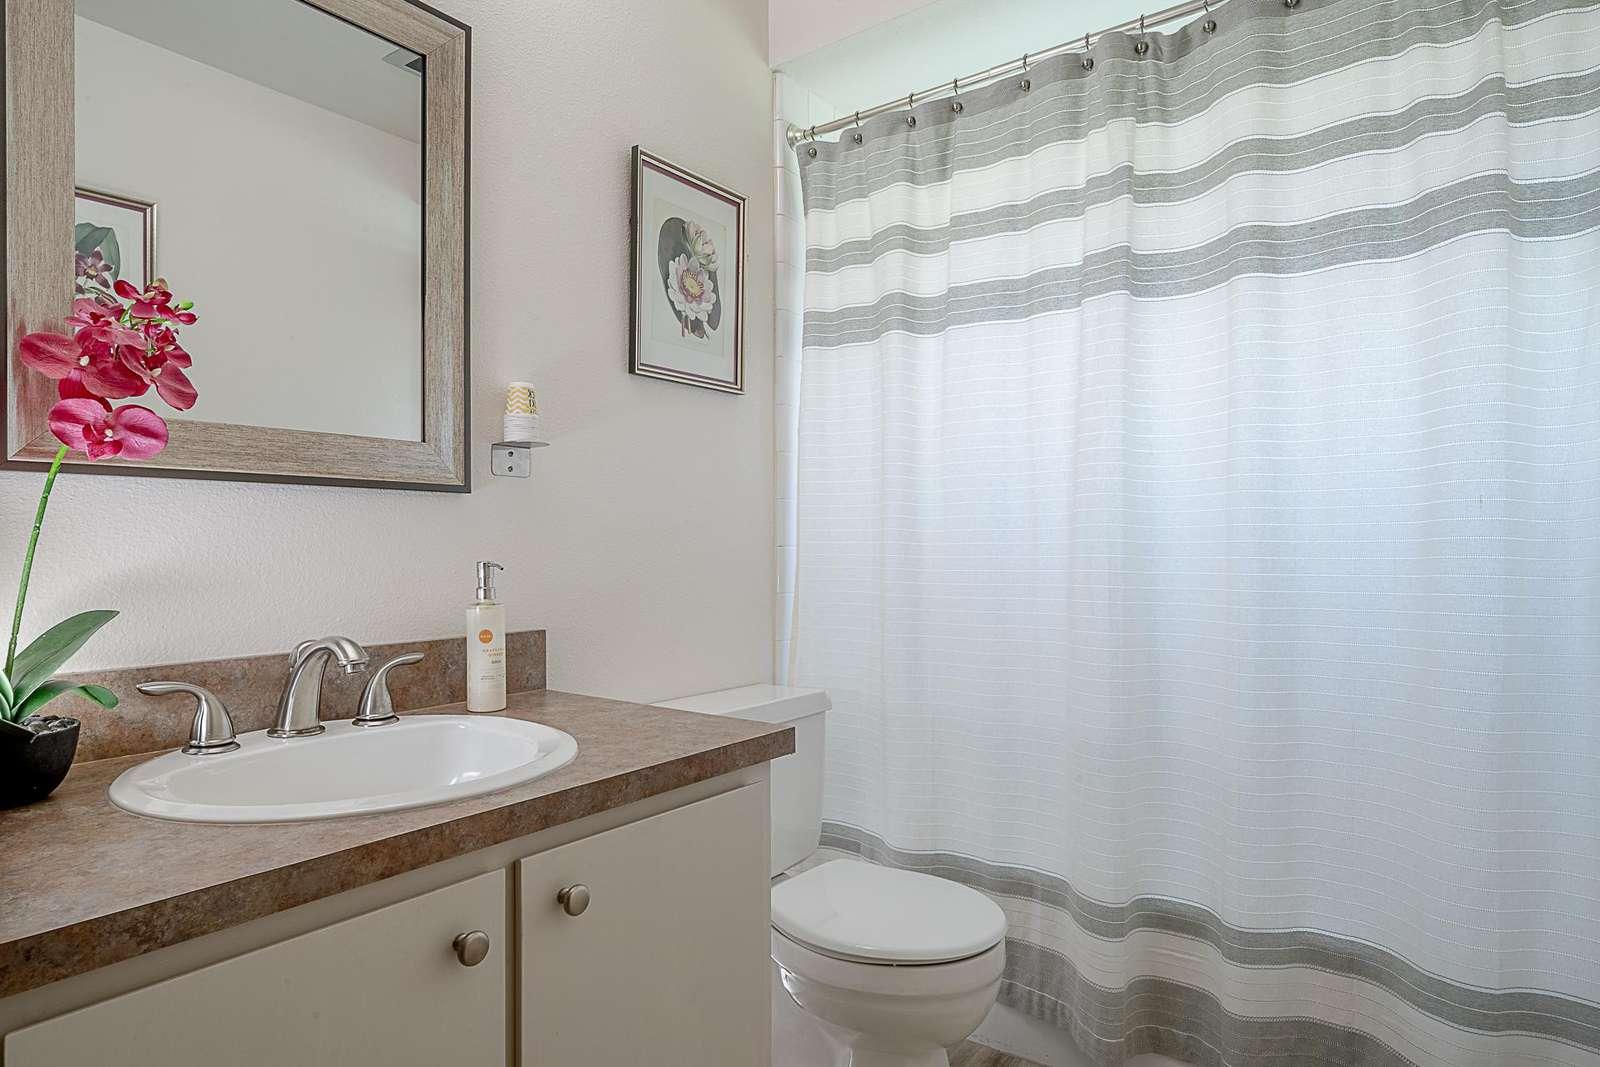 Hall Bathroom - Tub & Shower